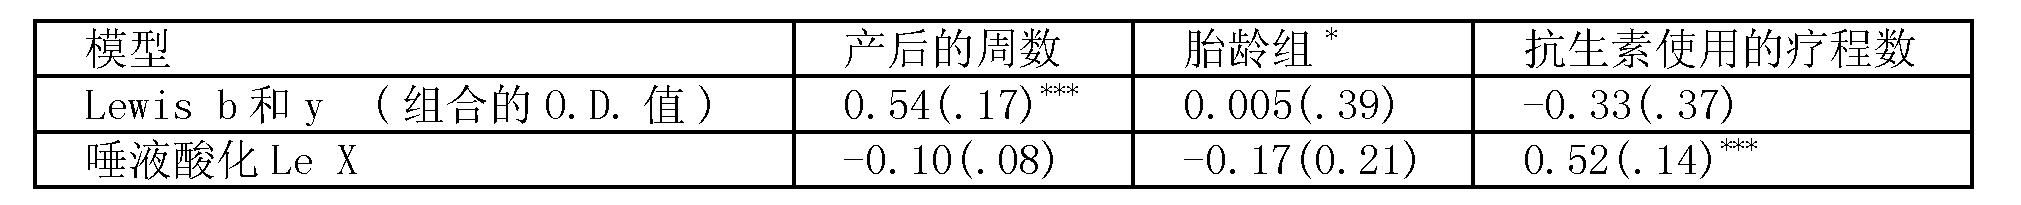 CN101855554B - Use of secretor, Lewis and sialyl antigen